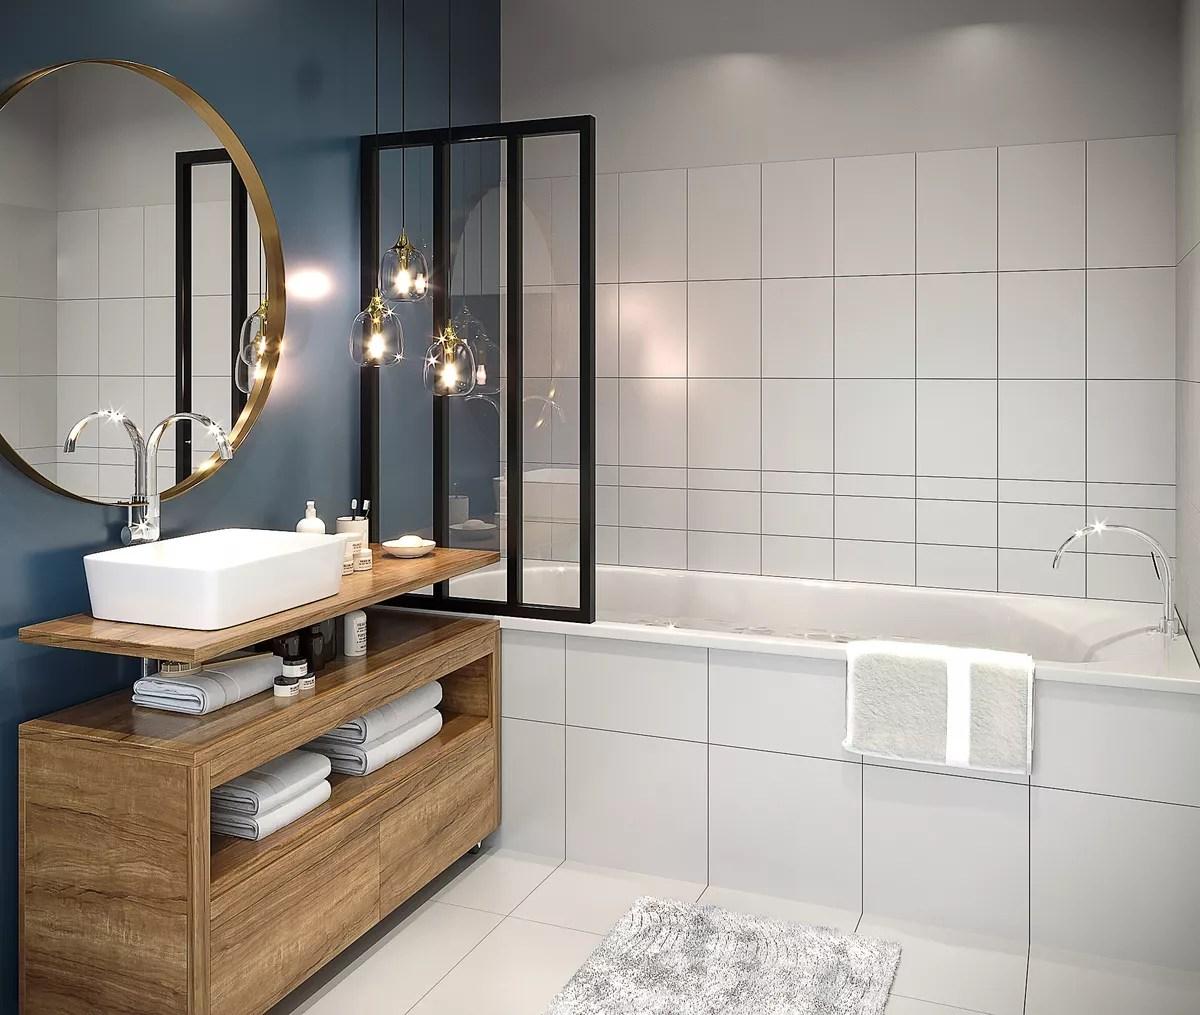 Comment relooker une salle de bains   Madame Figaro